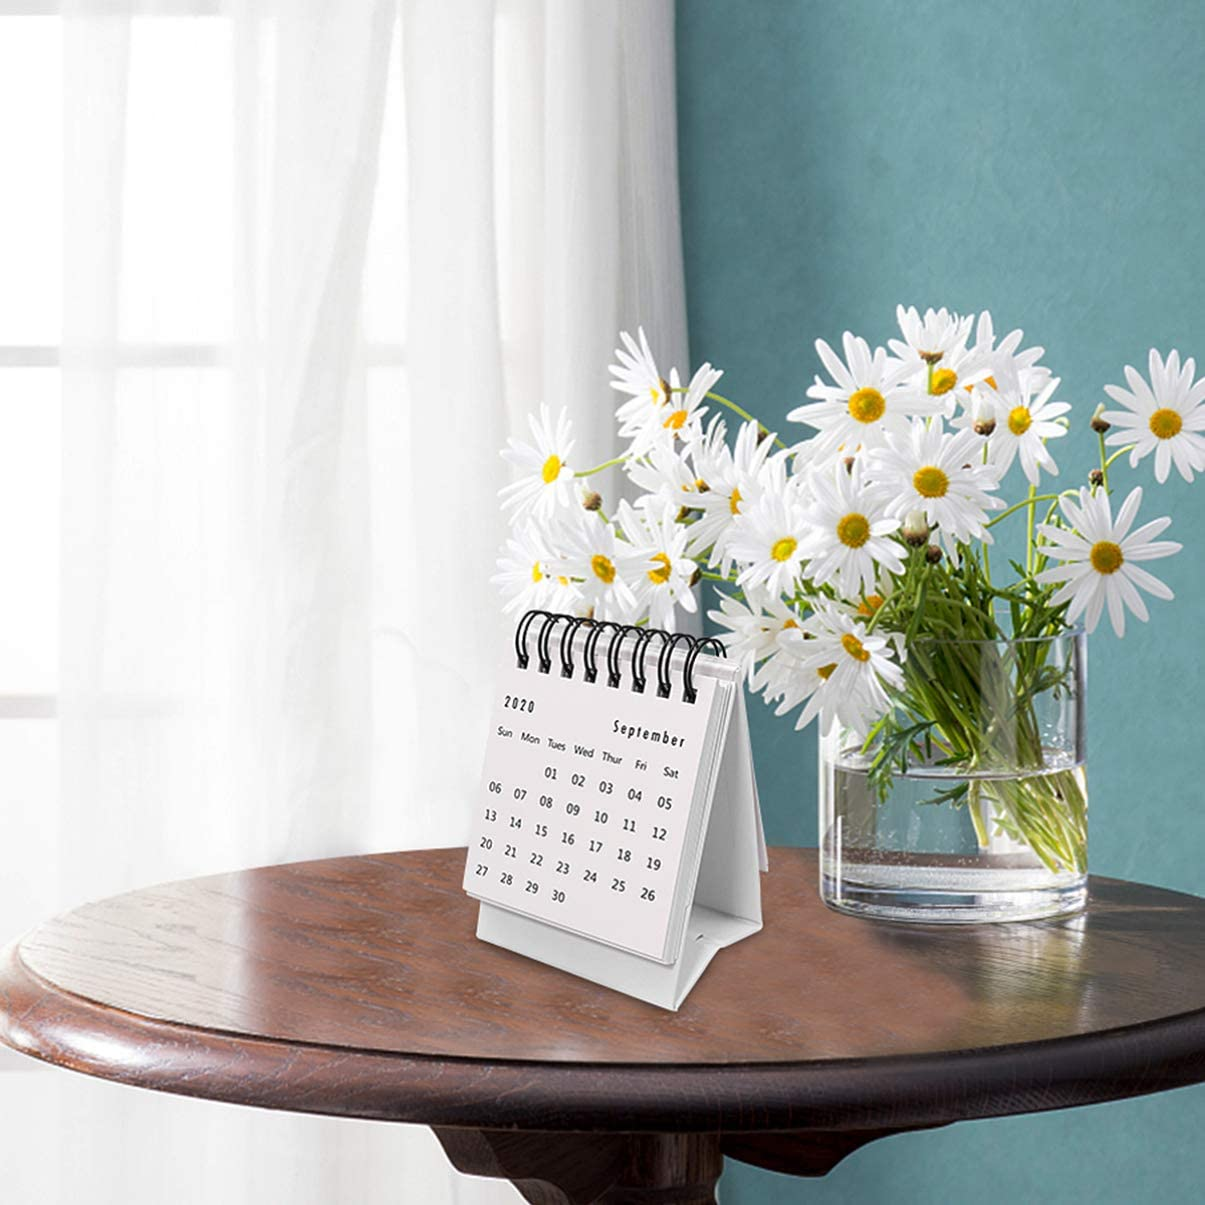 NUOBESTY 1Pc 2021 Mini Calendar Solid Color Calendar Schedule Planner Organiser Table Calendars Desk Memo for Office Home 2020.7-2021.12, Black